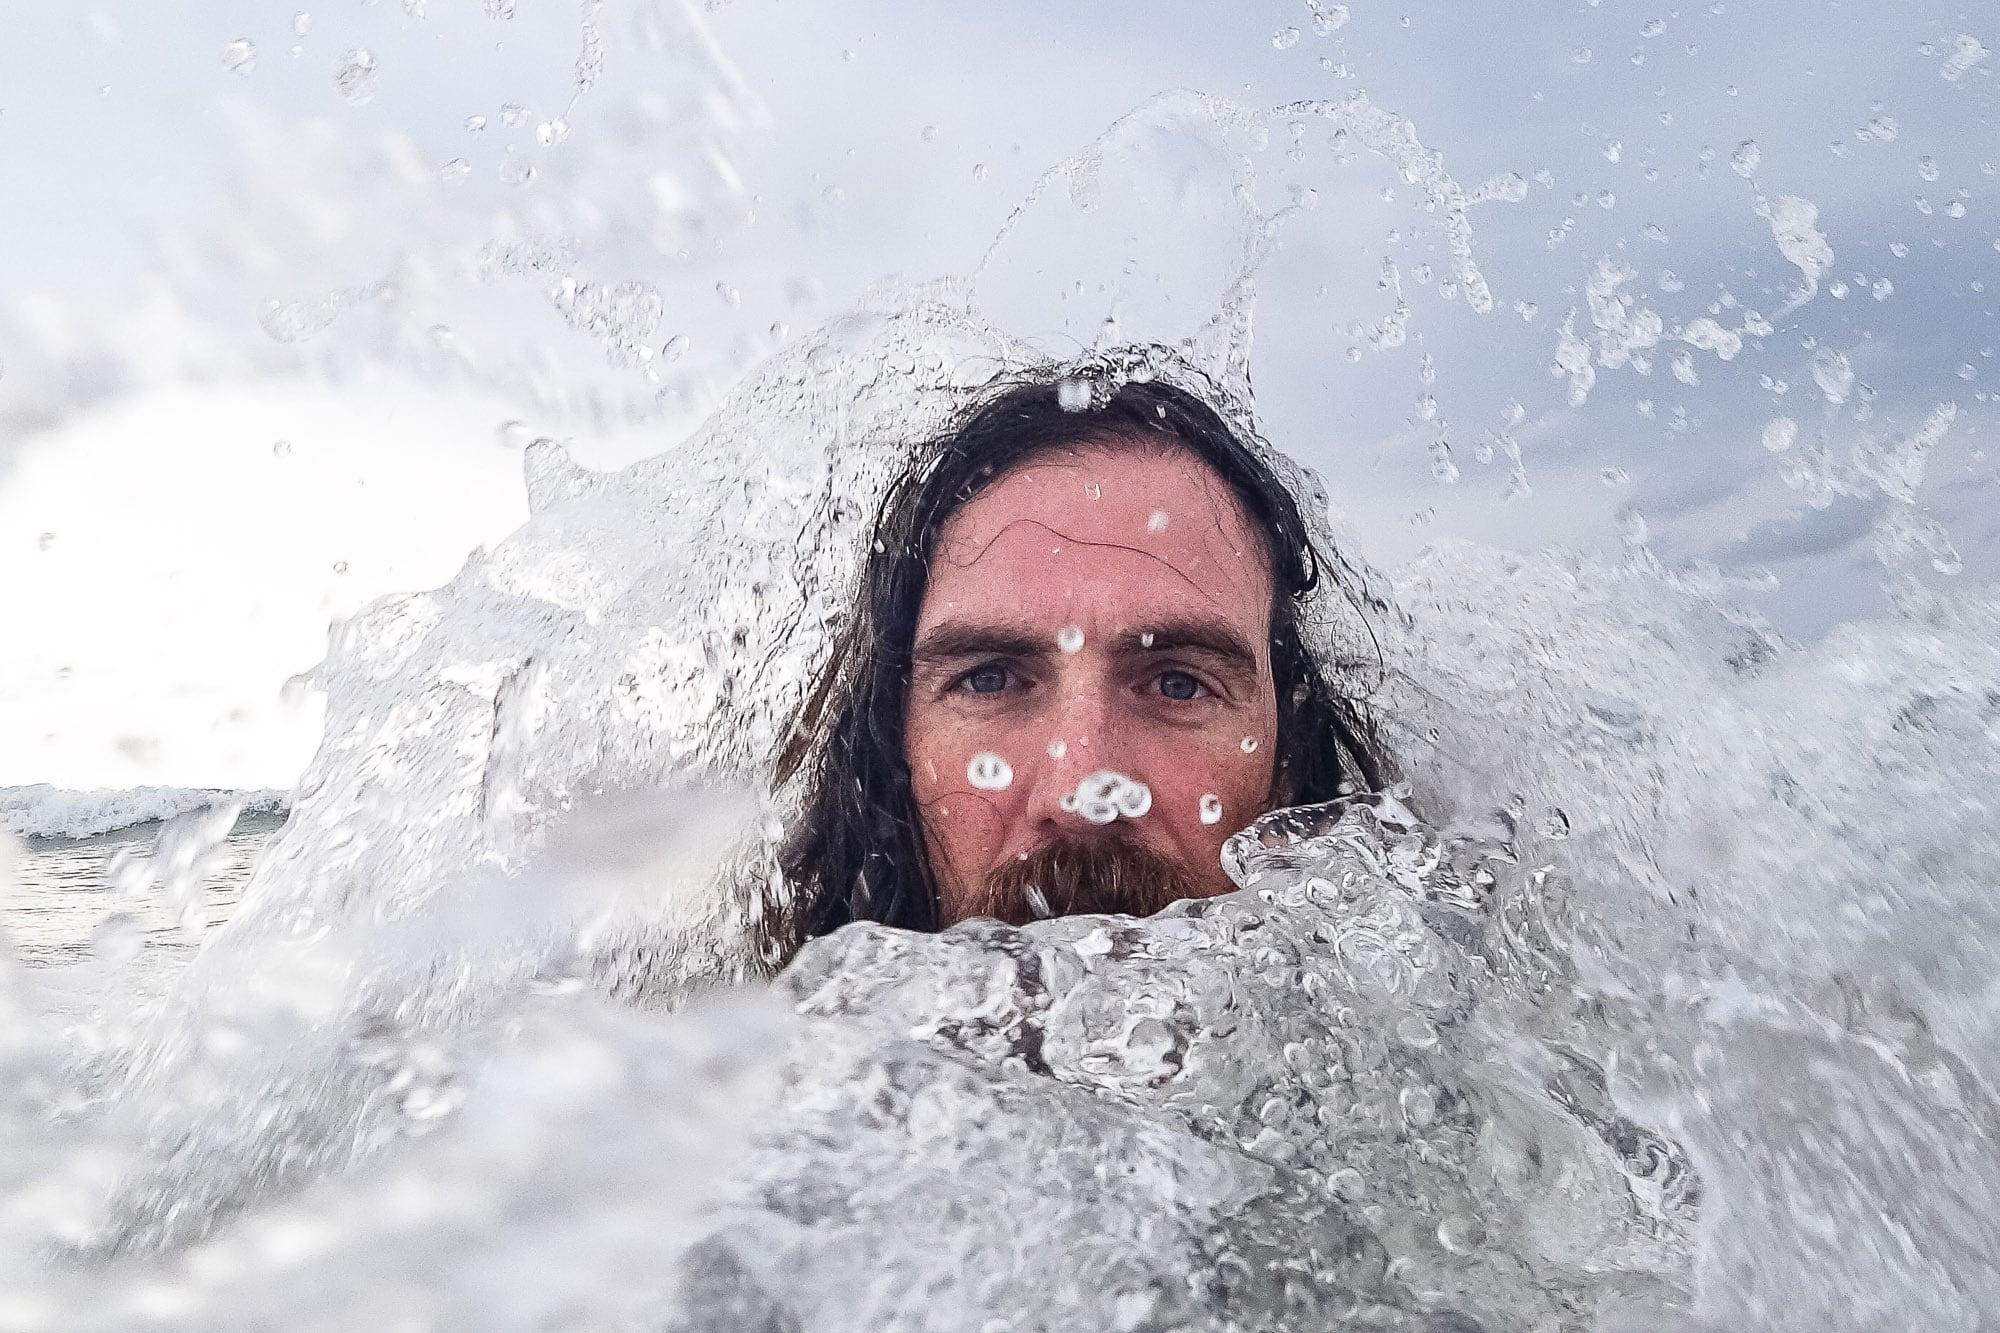 wave selfie 7